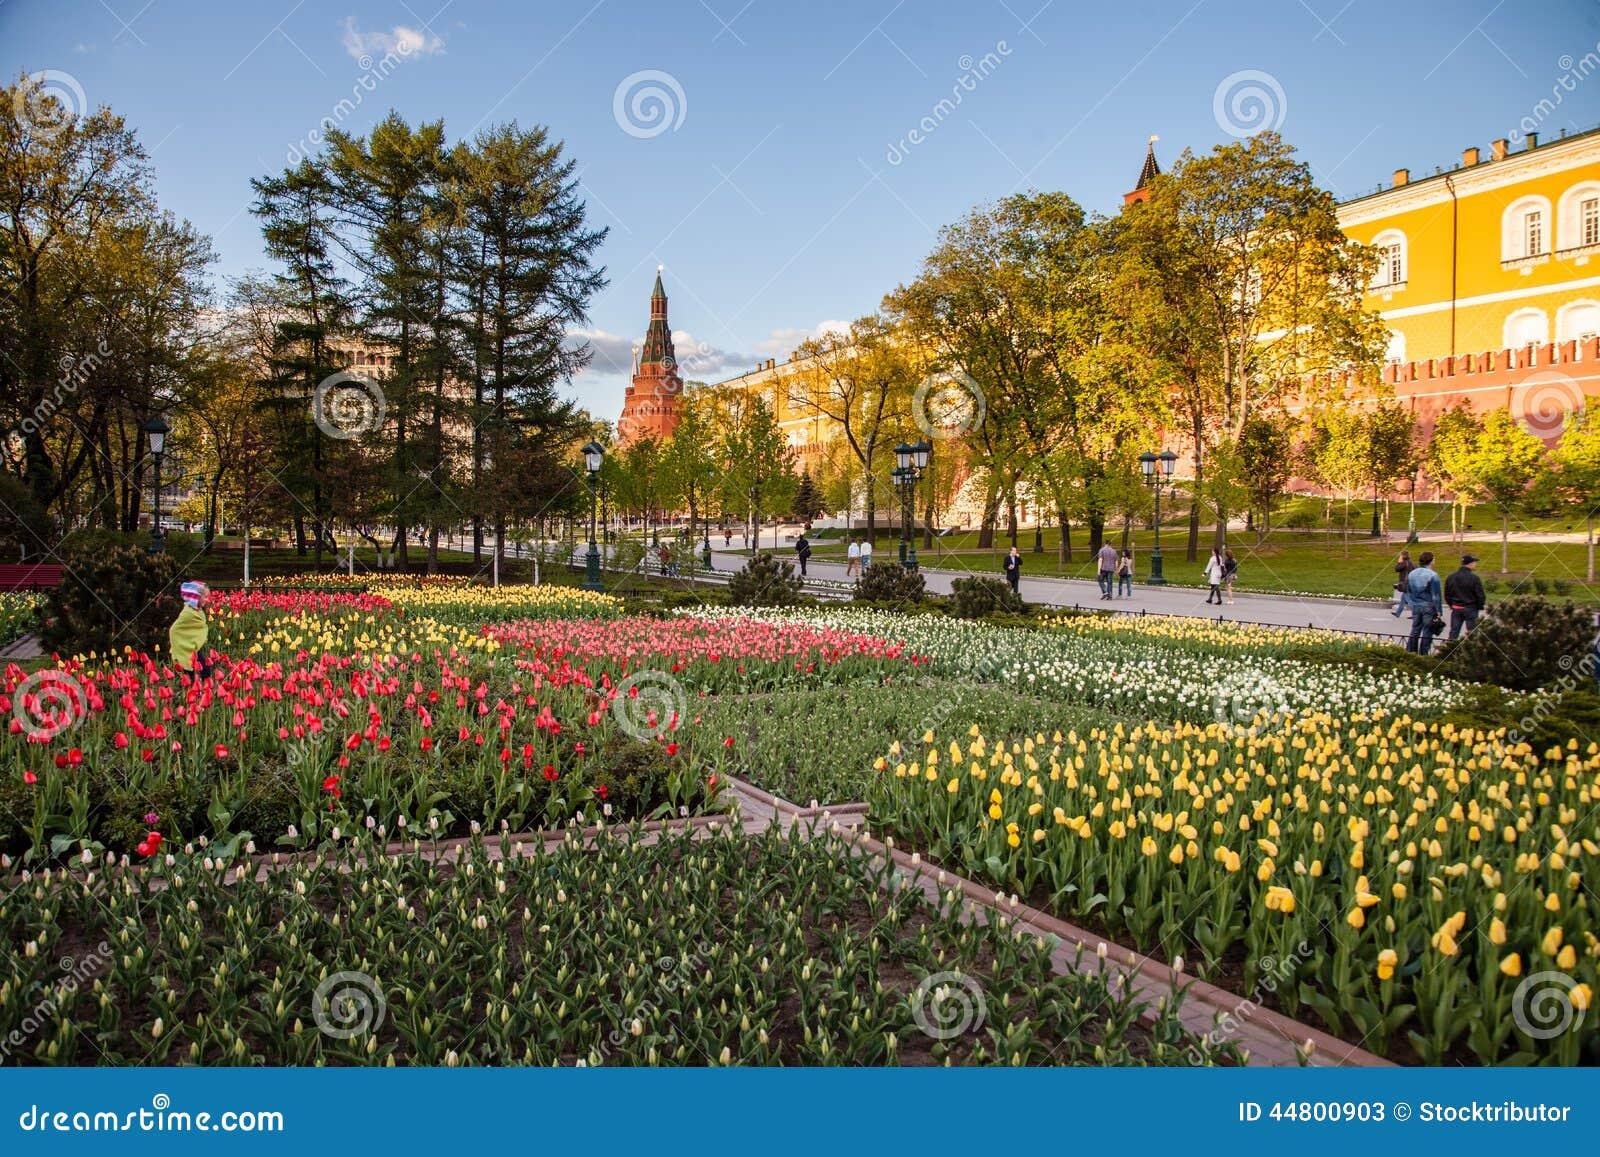 Kremlin garden with flowers in moscow editorial stock photo image kremlin garden with flowers in moscow izmirmasajfo